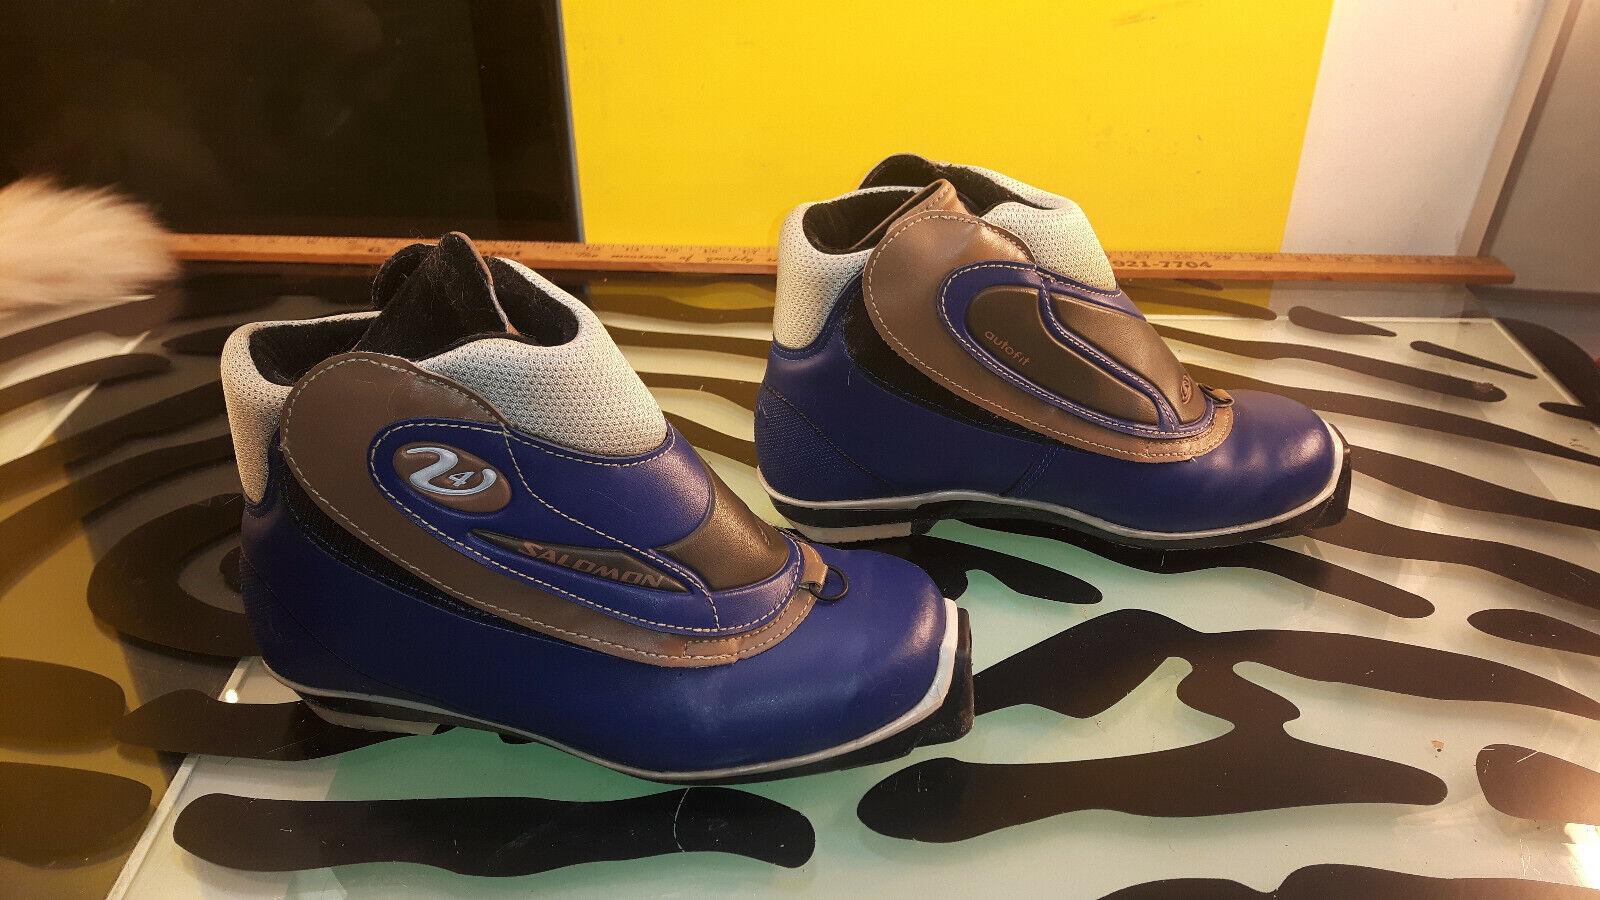 Salomon Autofit Womens Cross Country  Ski Boots Good Condition Size 6.5  discount sales